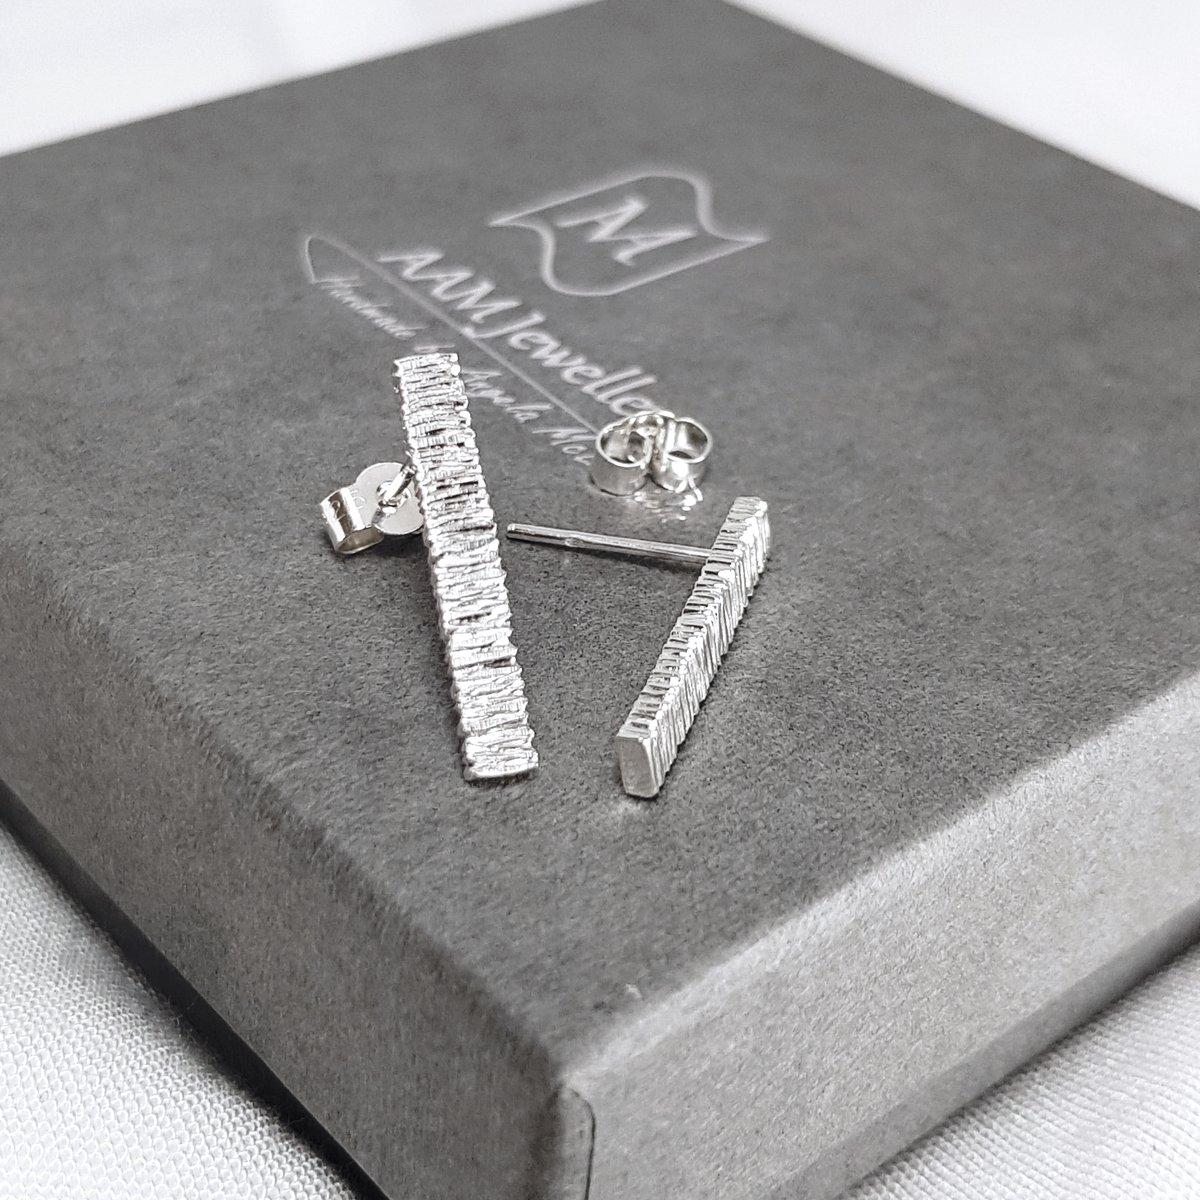 Image of Contemporary Silver Bar Stud Earrings - Handmade Sterling Silver Bar Earrings